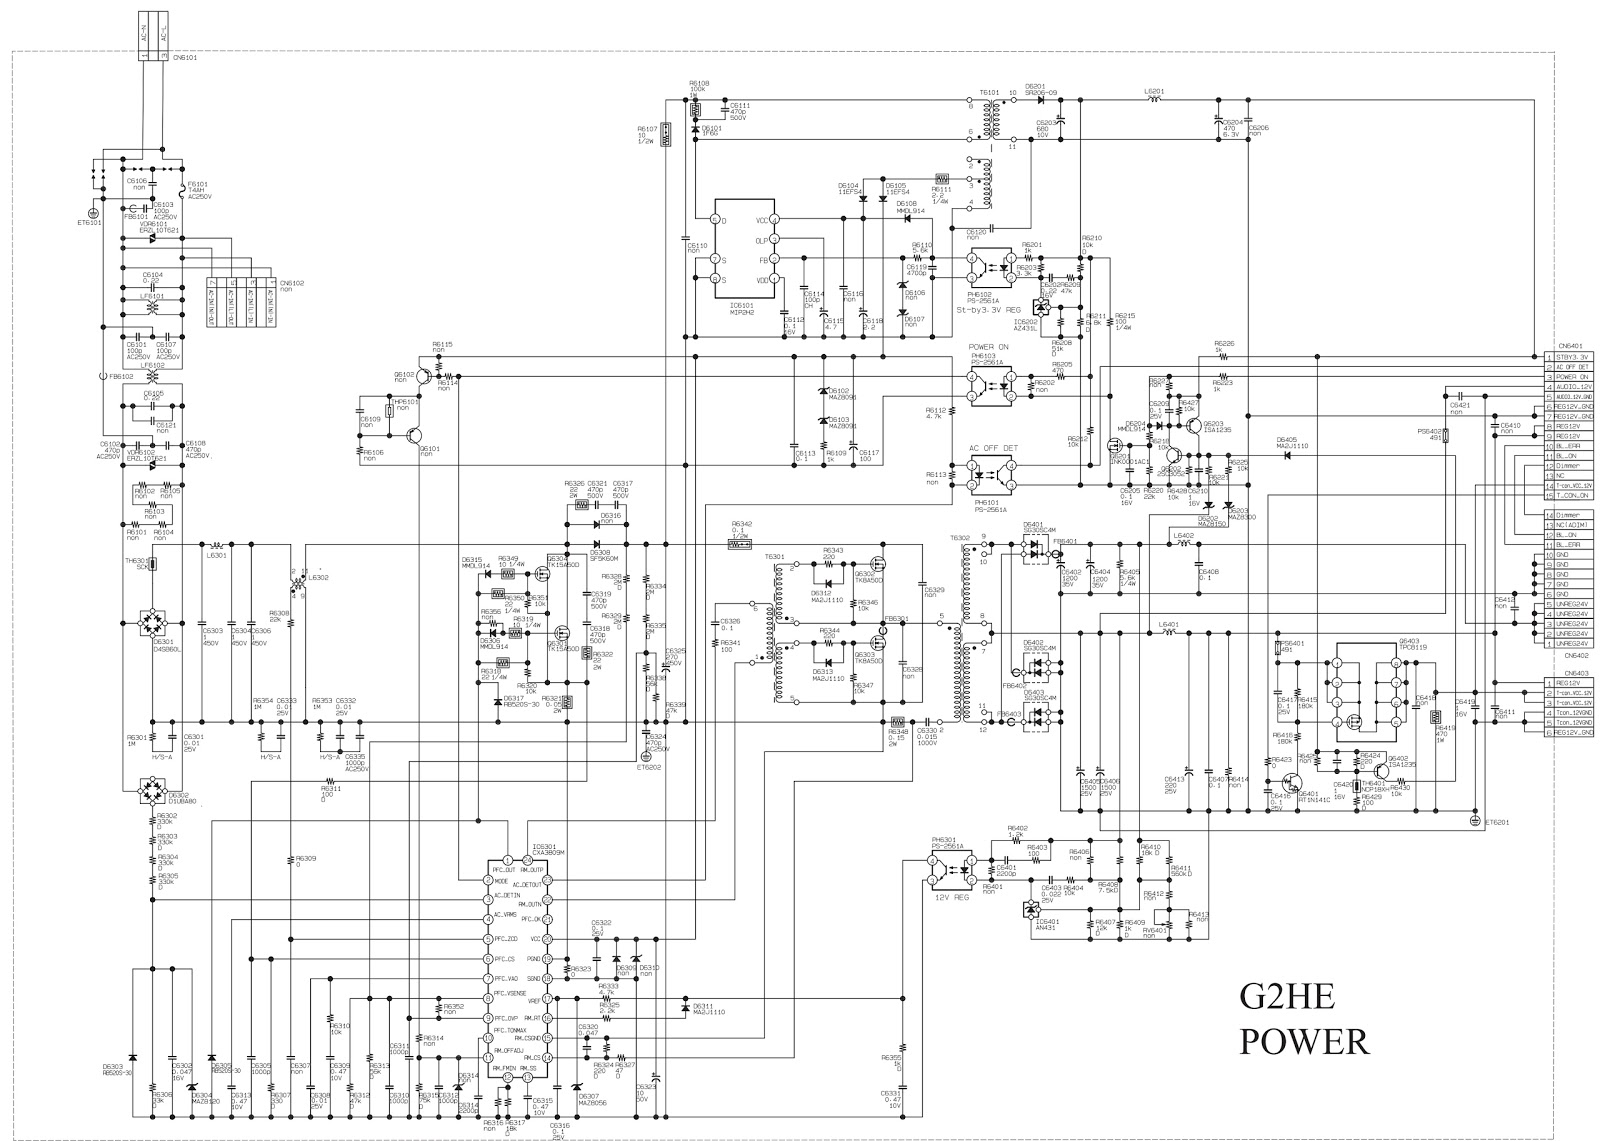 electro help  sony kdl32ex407  kdl40ex407 lcd tv power board  u2013 g2le board schematic